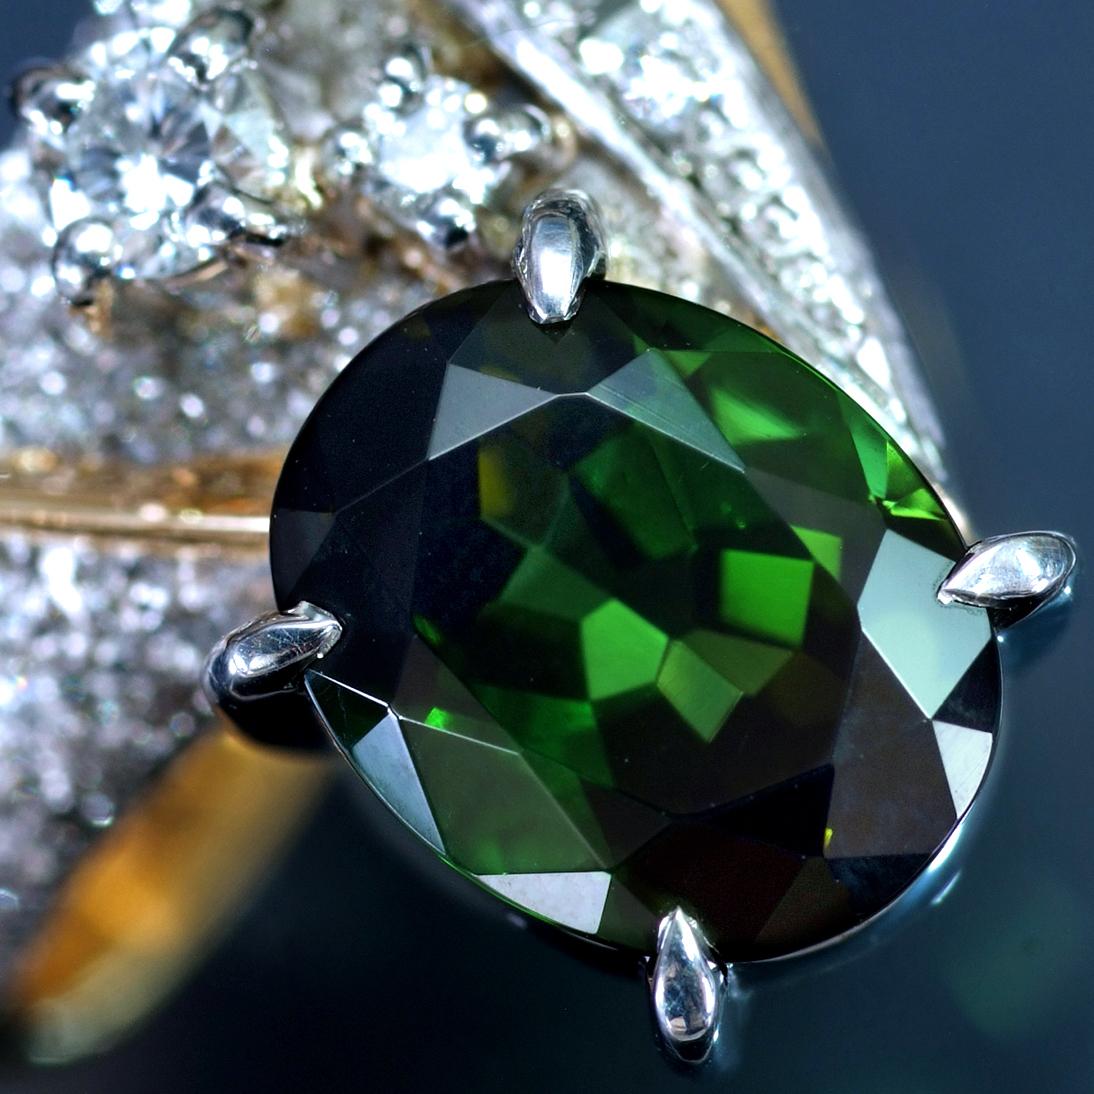 E8114【石川暢子先生】逸品グリーントルマリン 天然絶品ダイヤモンド 最高級18金/Pt900無垢リング サイズ13号 重量11.4g 縦幅15.5mm_画像3